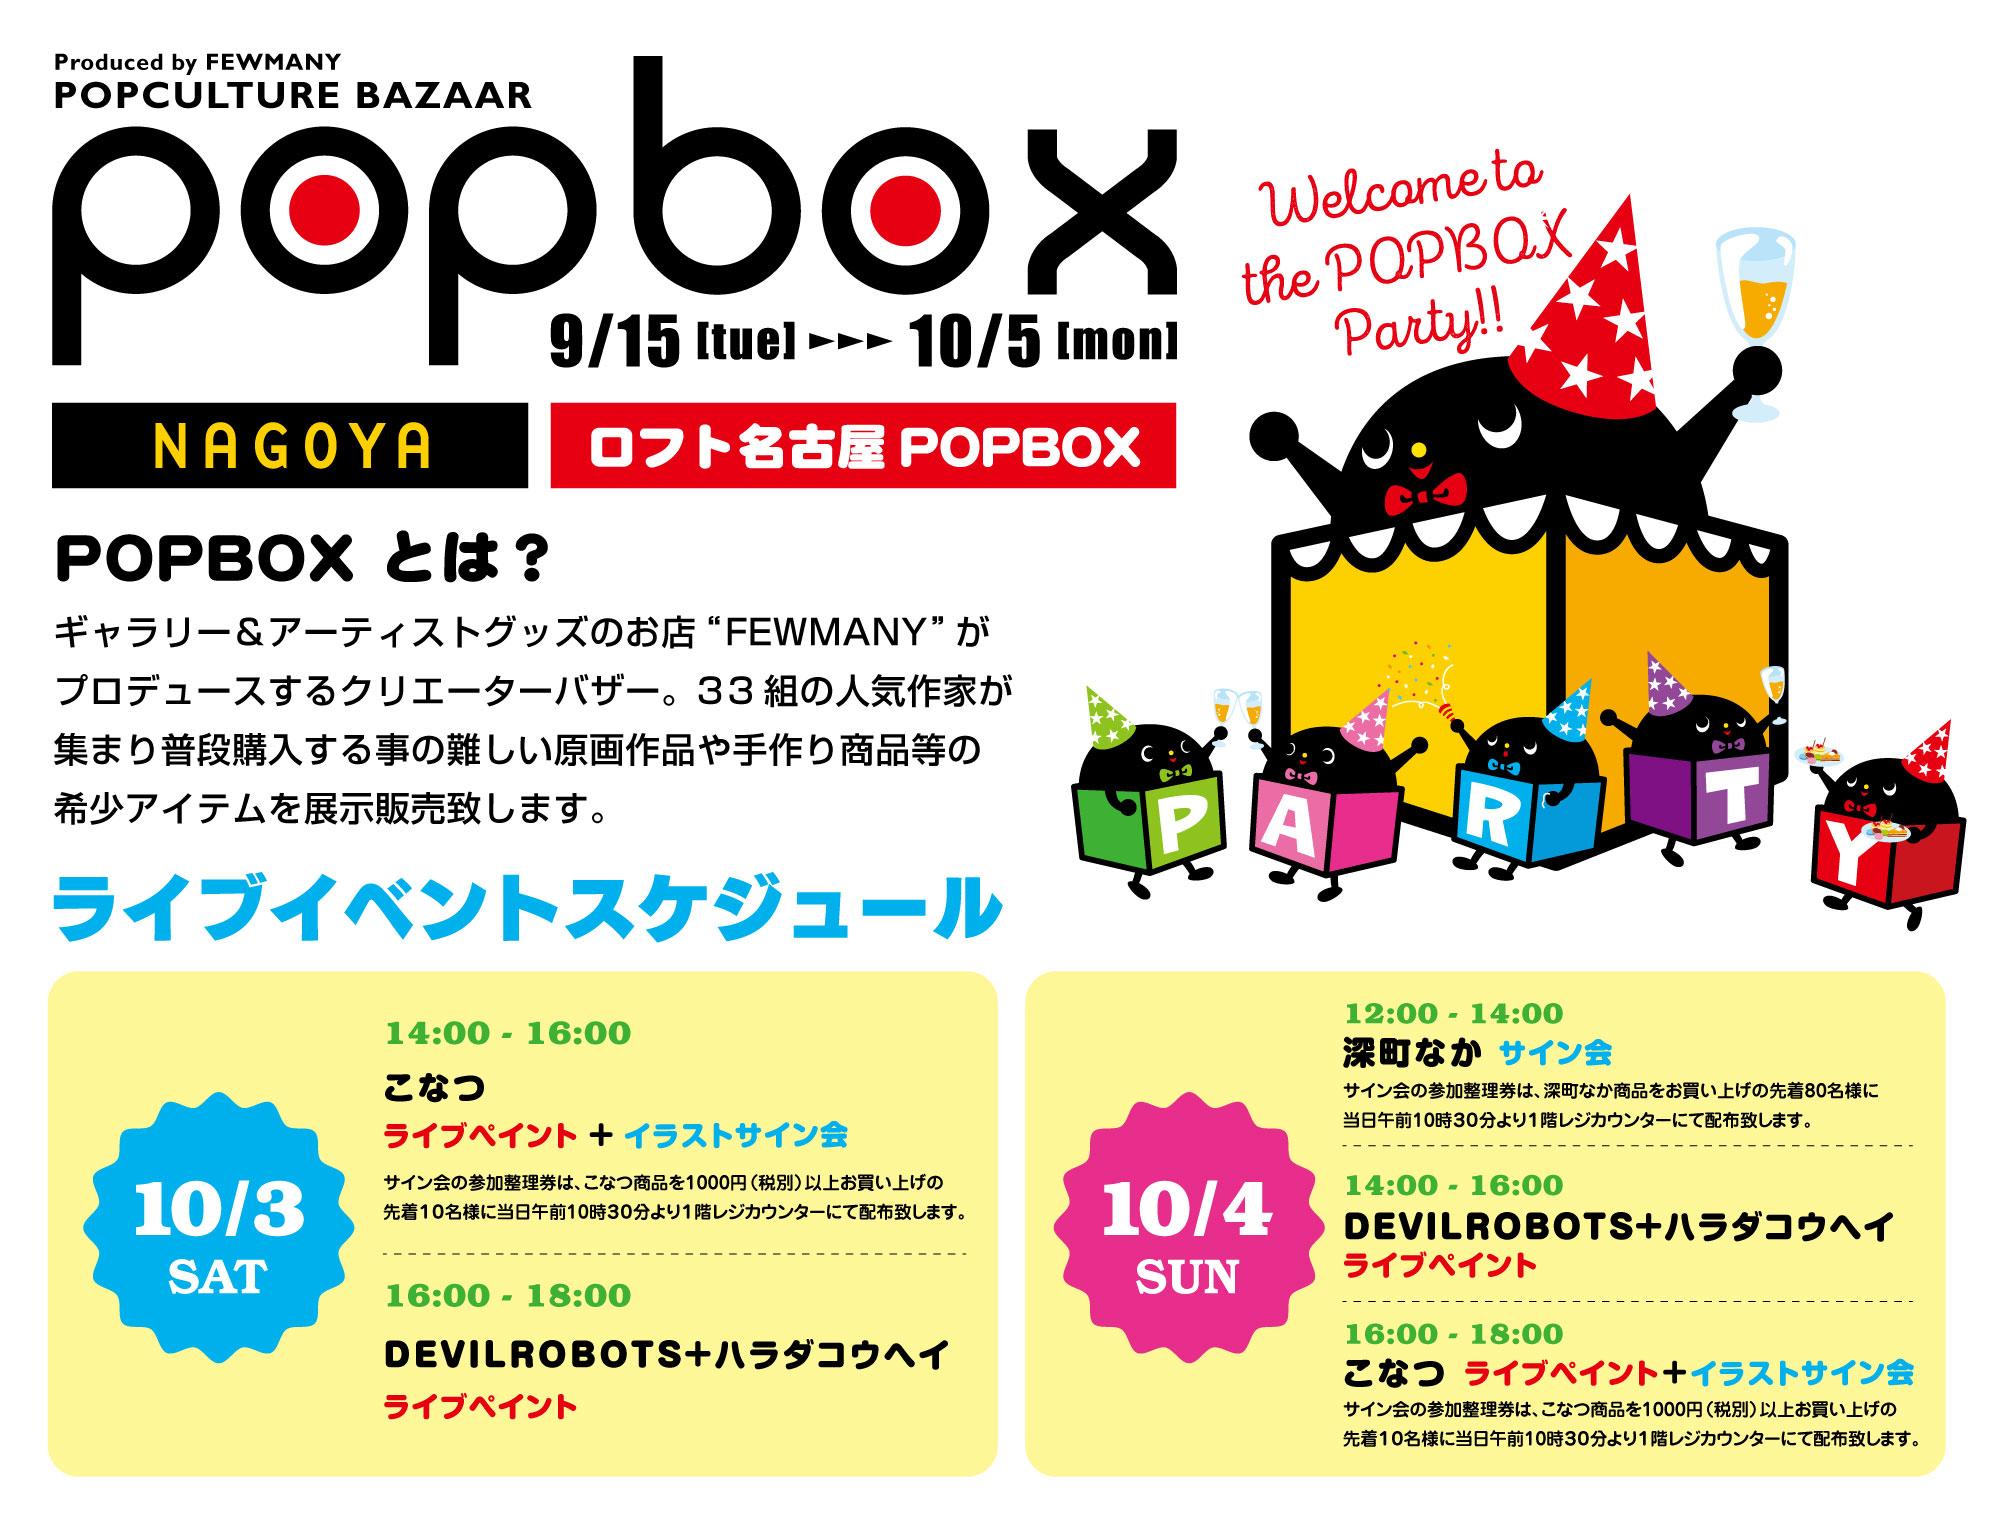 A4_POPbox_nagoya.jpg